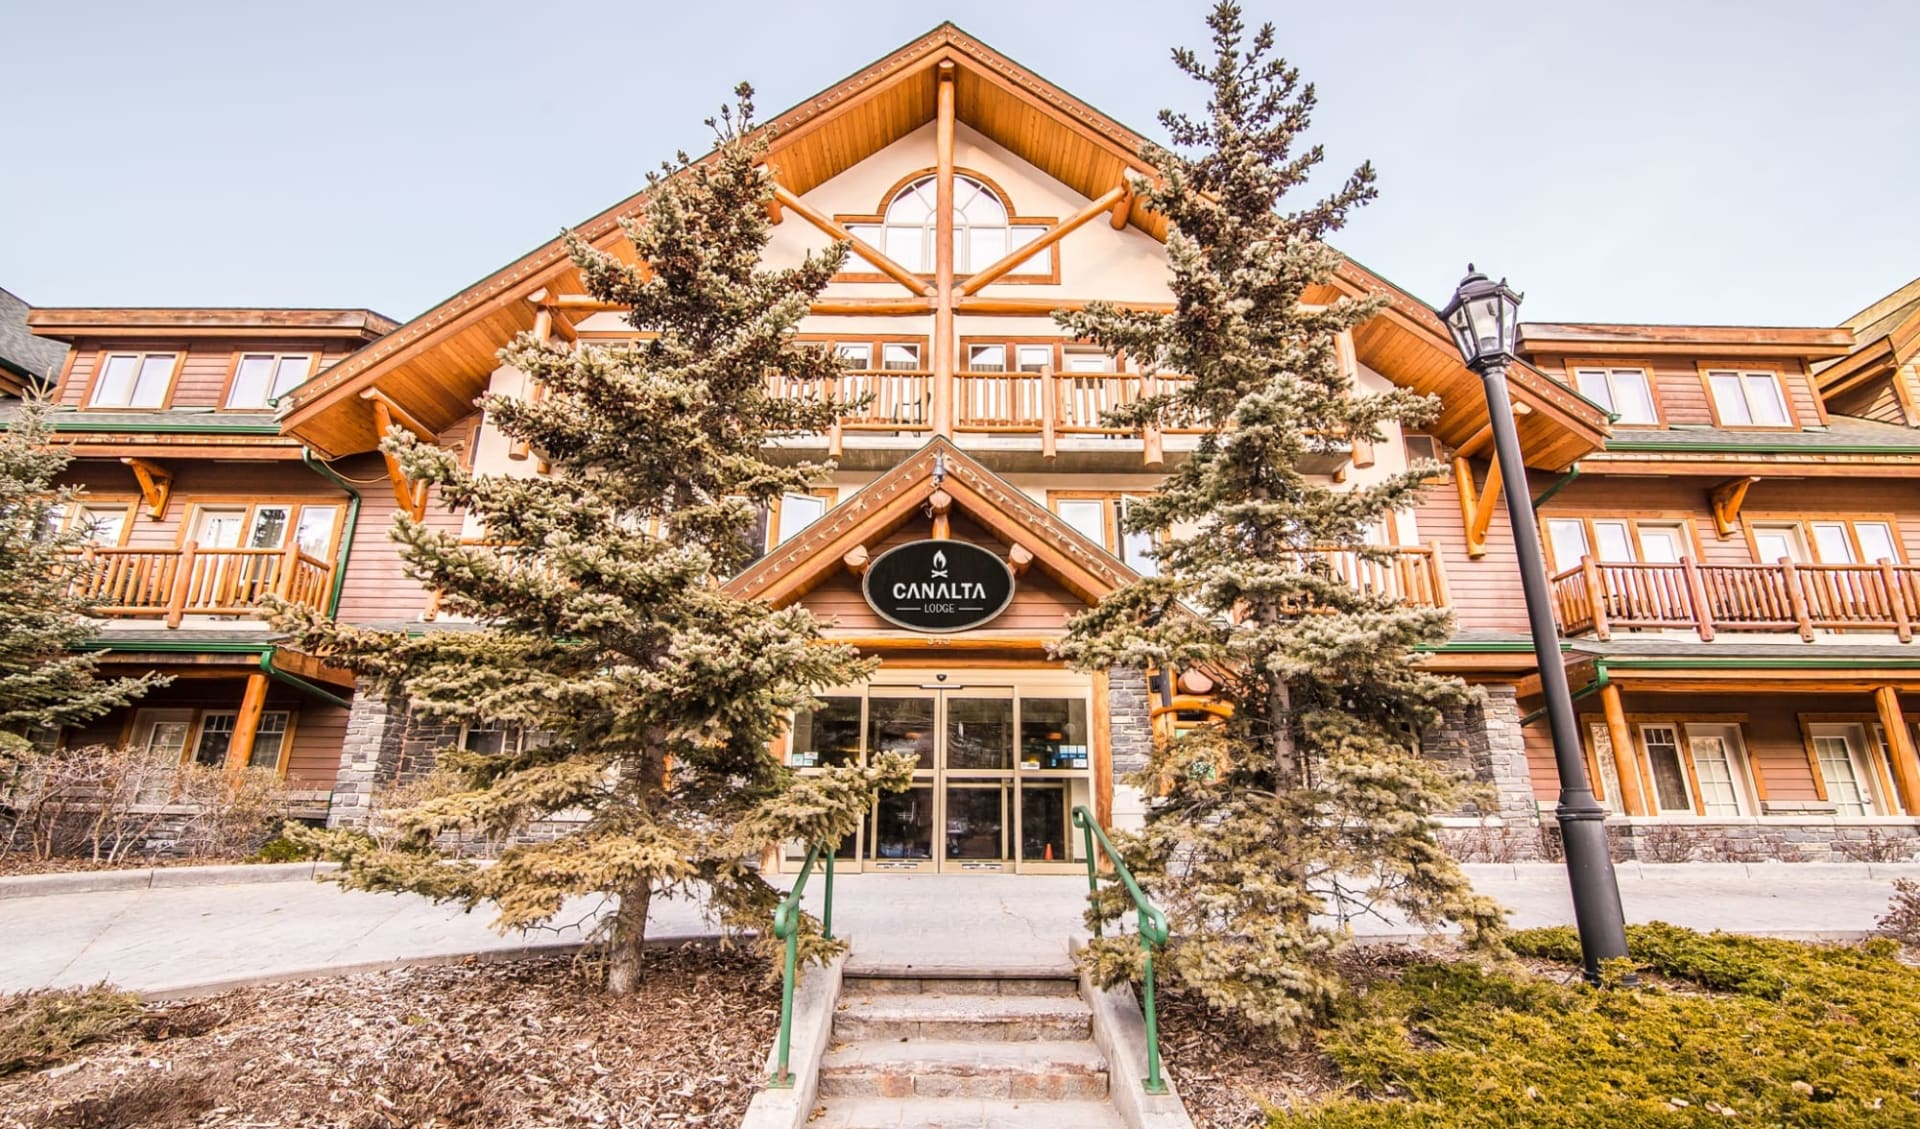 Canalta Lodge in Banff: Canalta Lodge